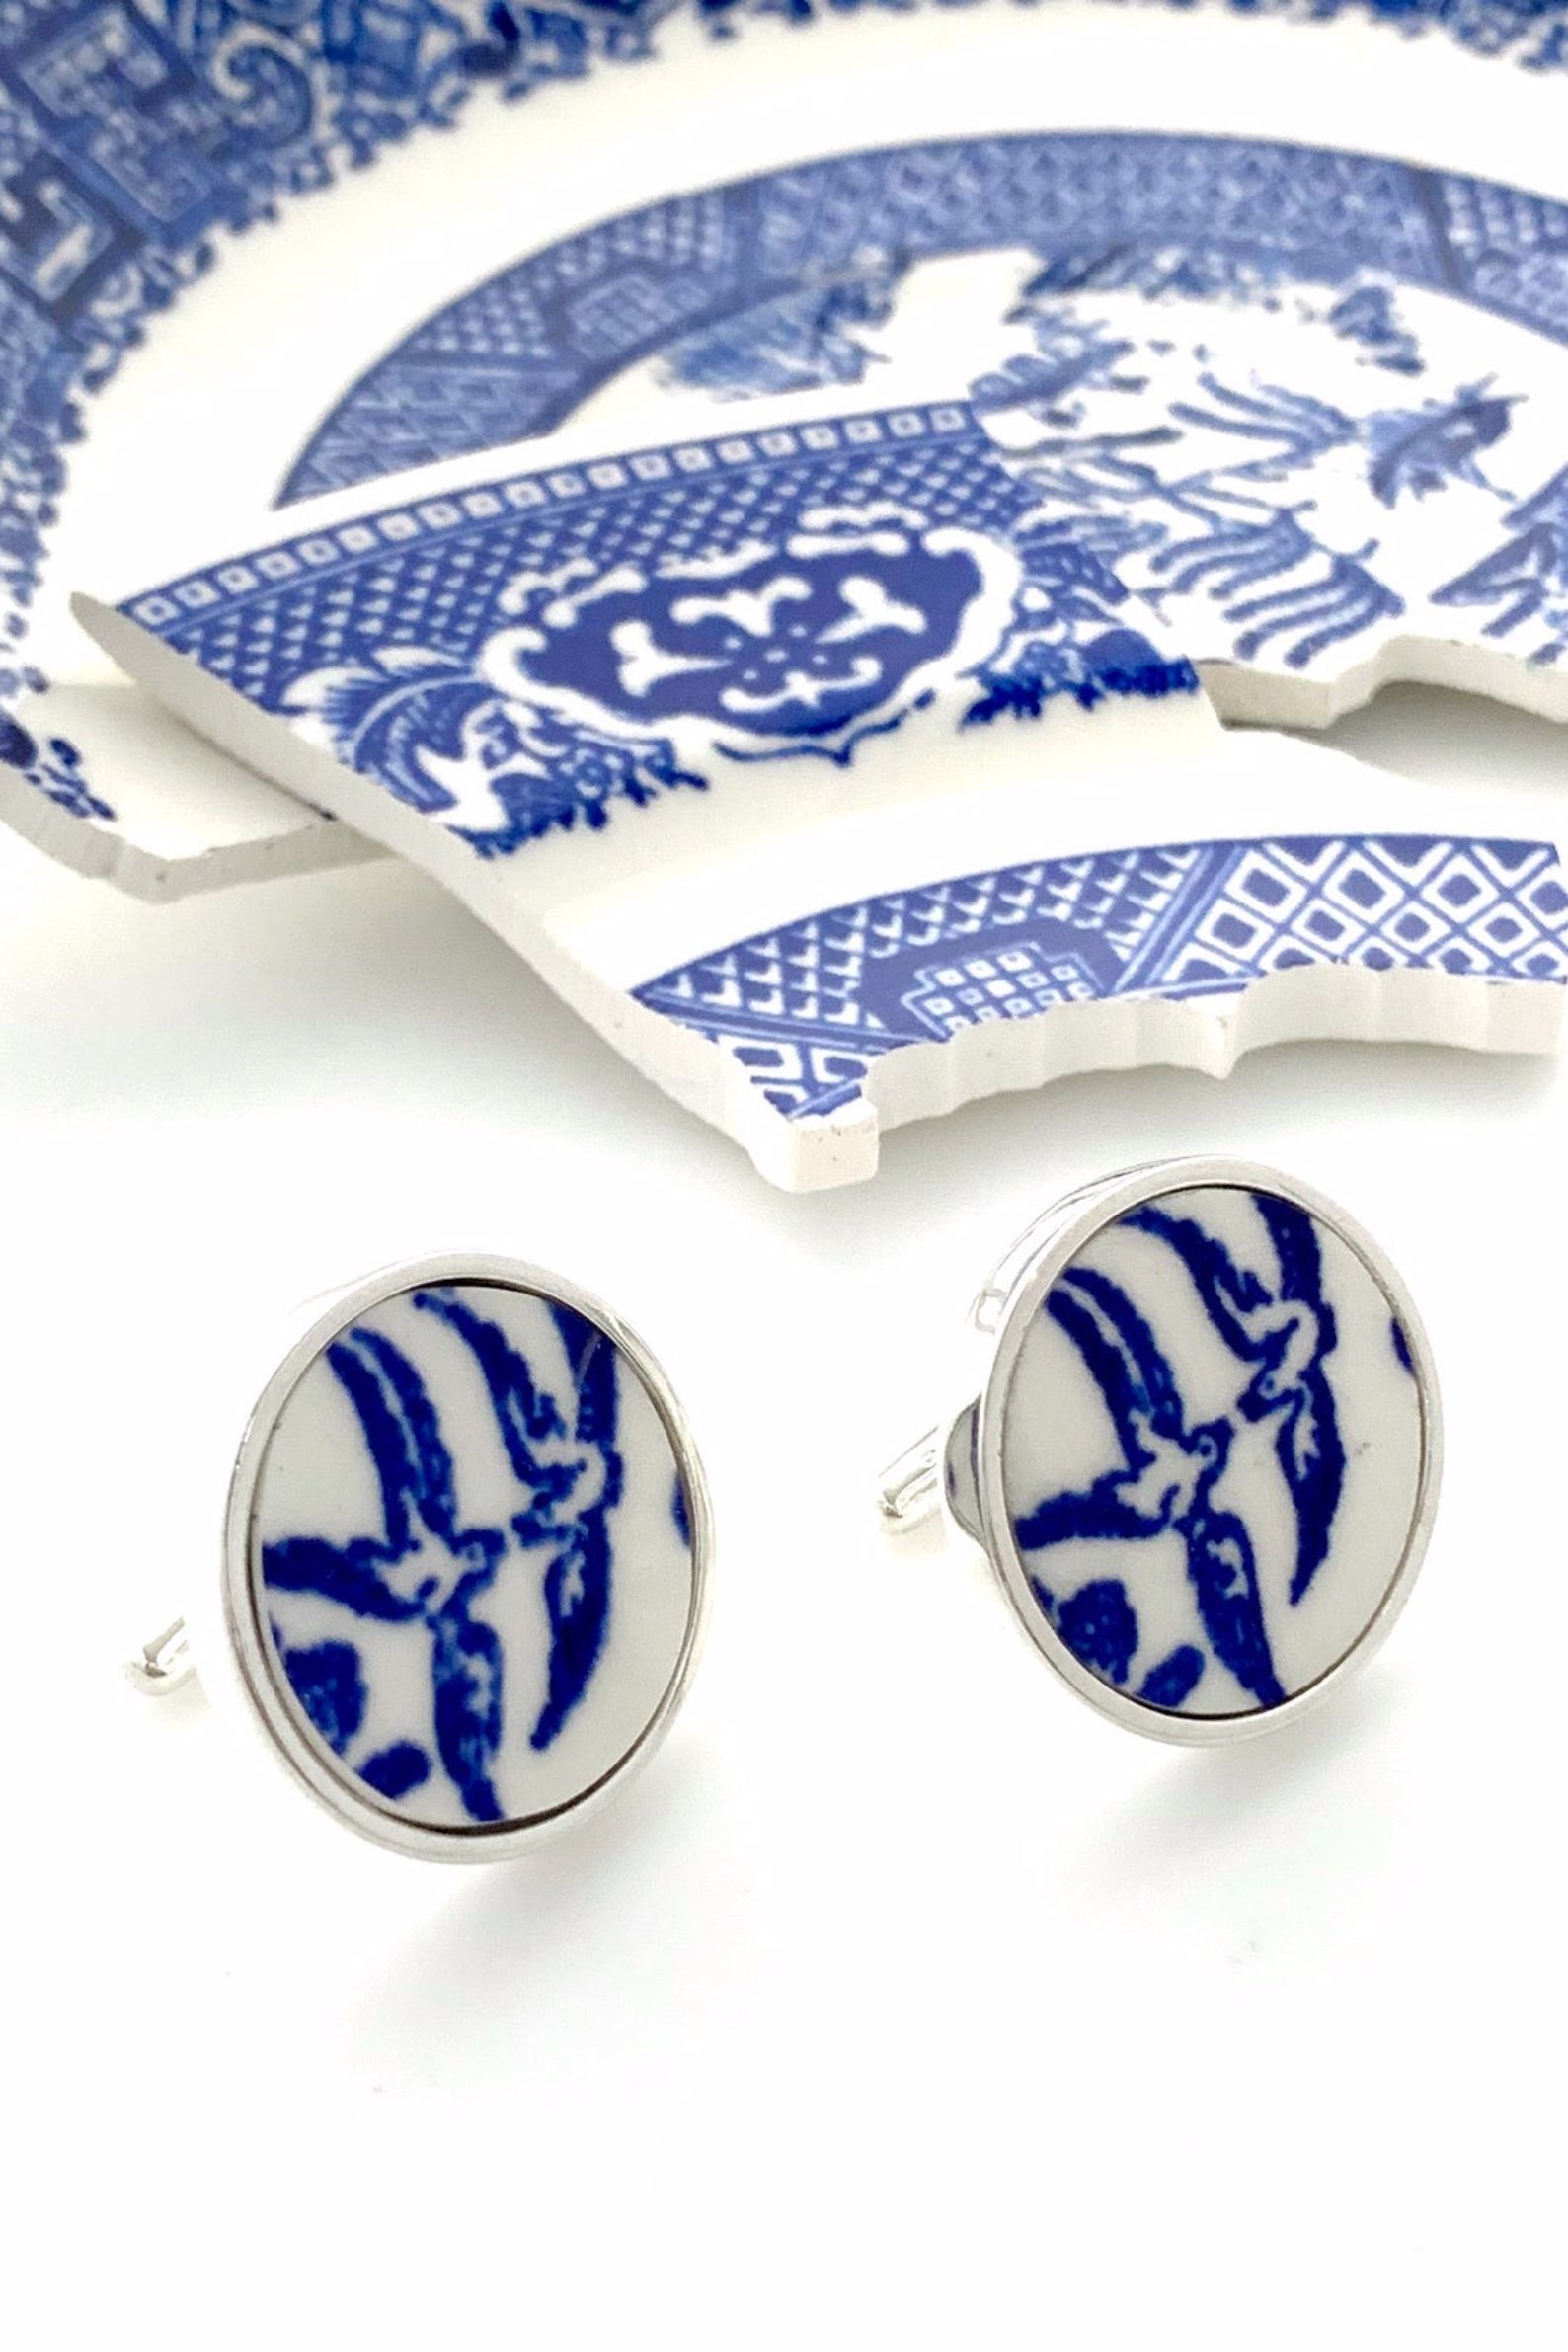 Blue Willow China Cuff Links #20thanniversarywedding